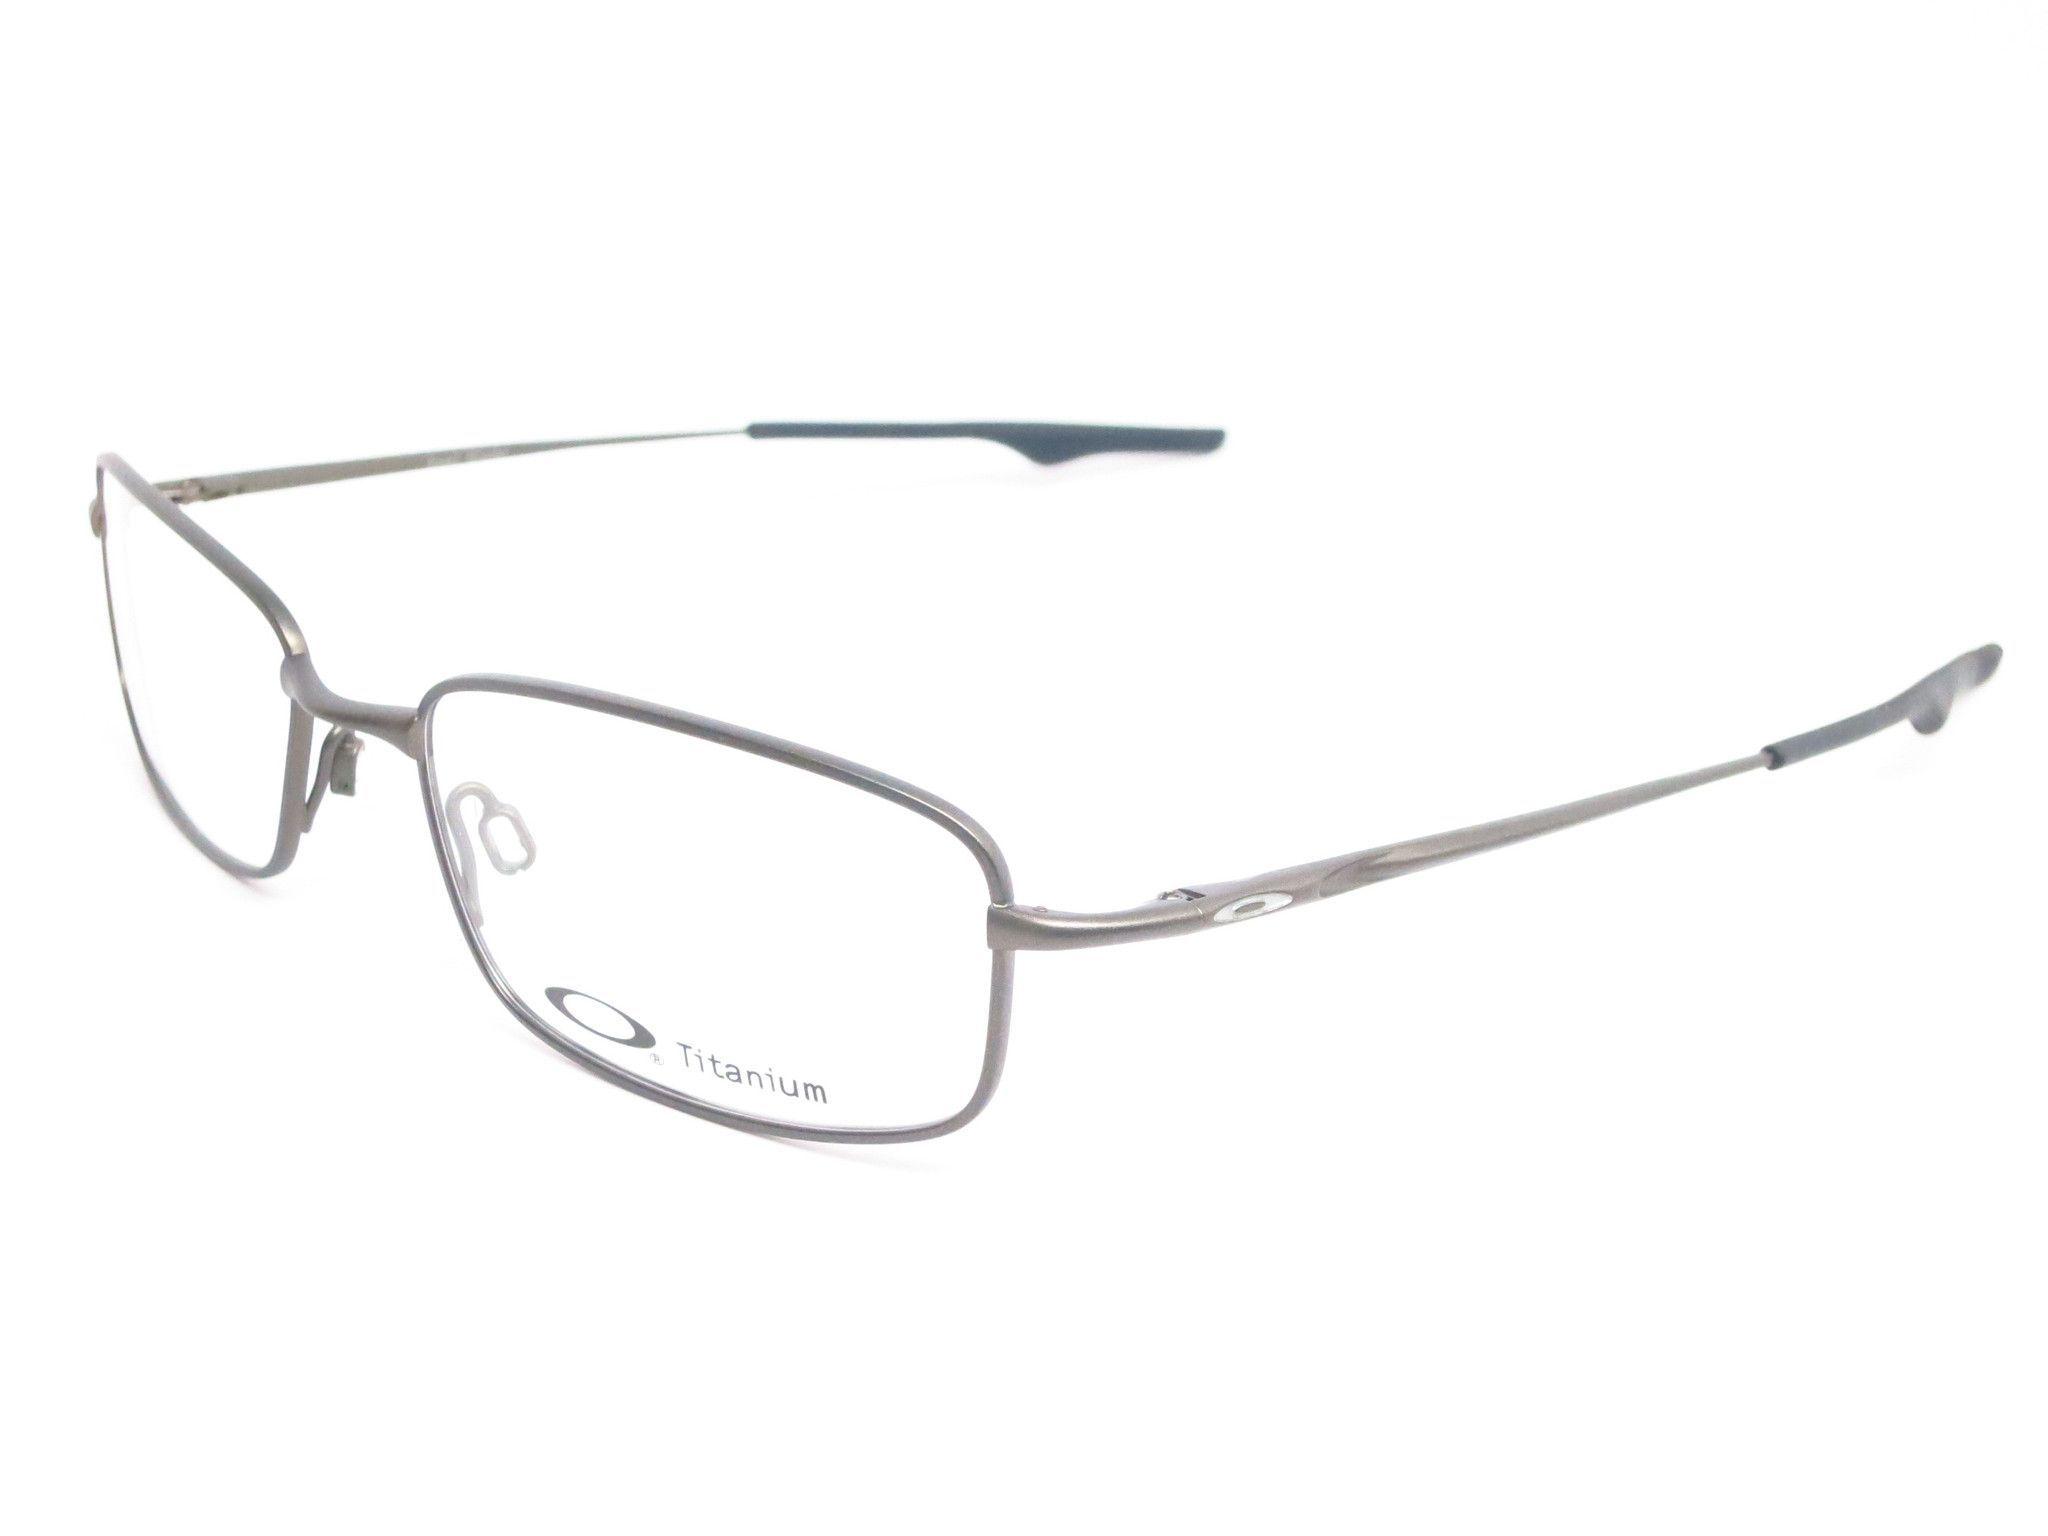 Oakley Keel Blade OX3125-0853 Pewter Eyeglasses | Oakley, Blade and ...